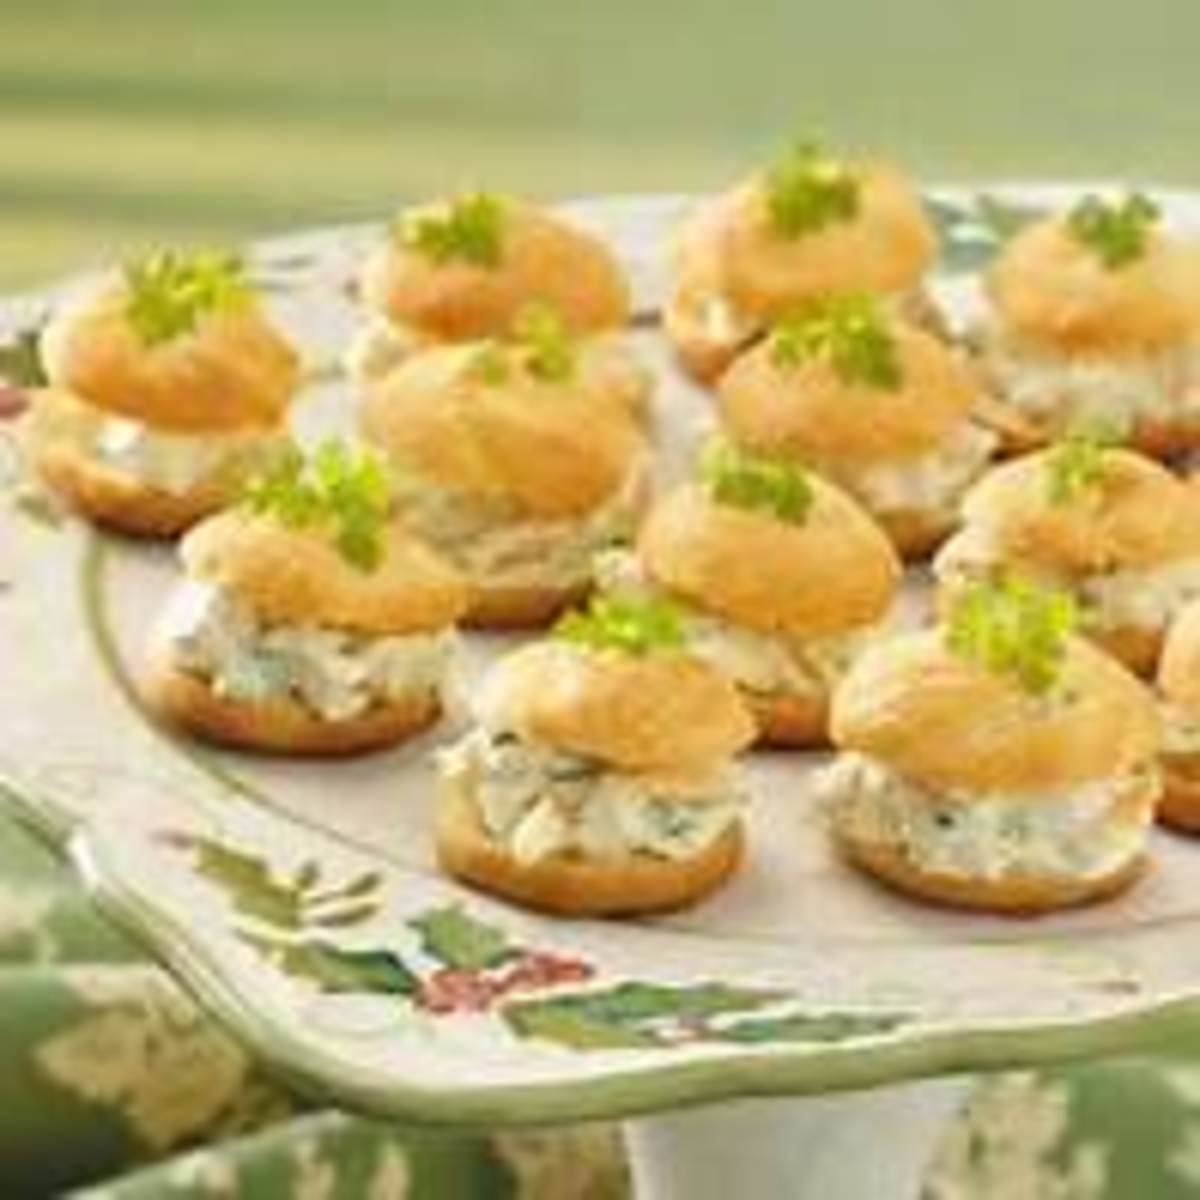 Cream puffs with tuna salad